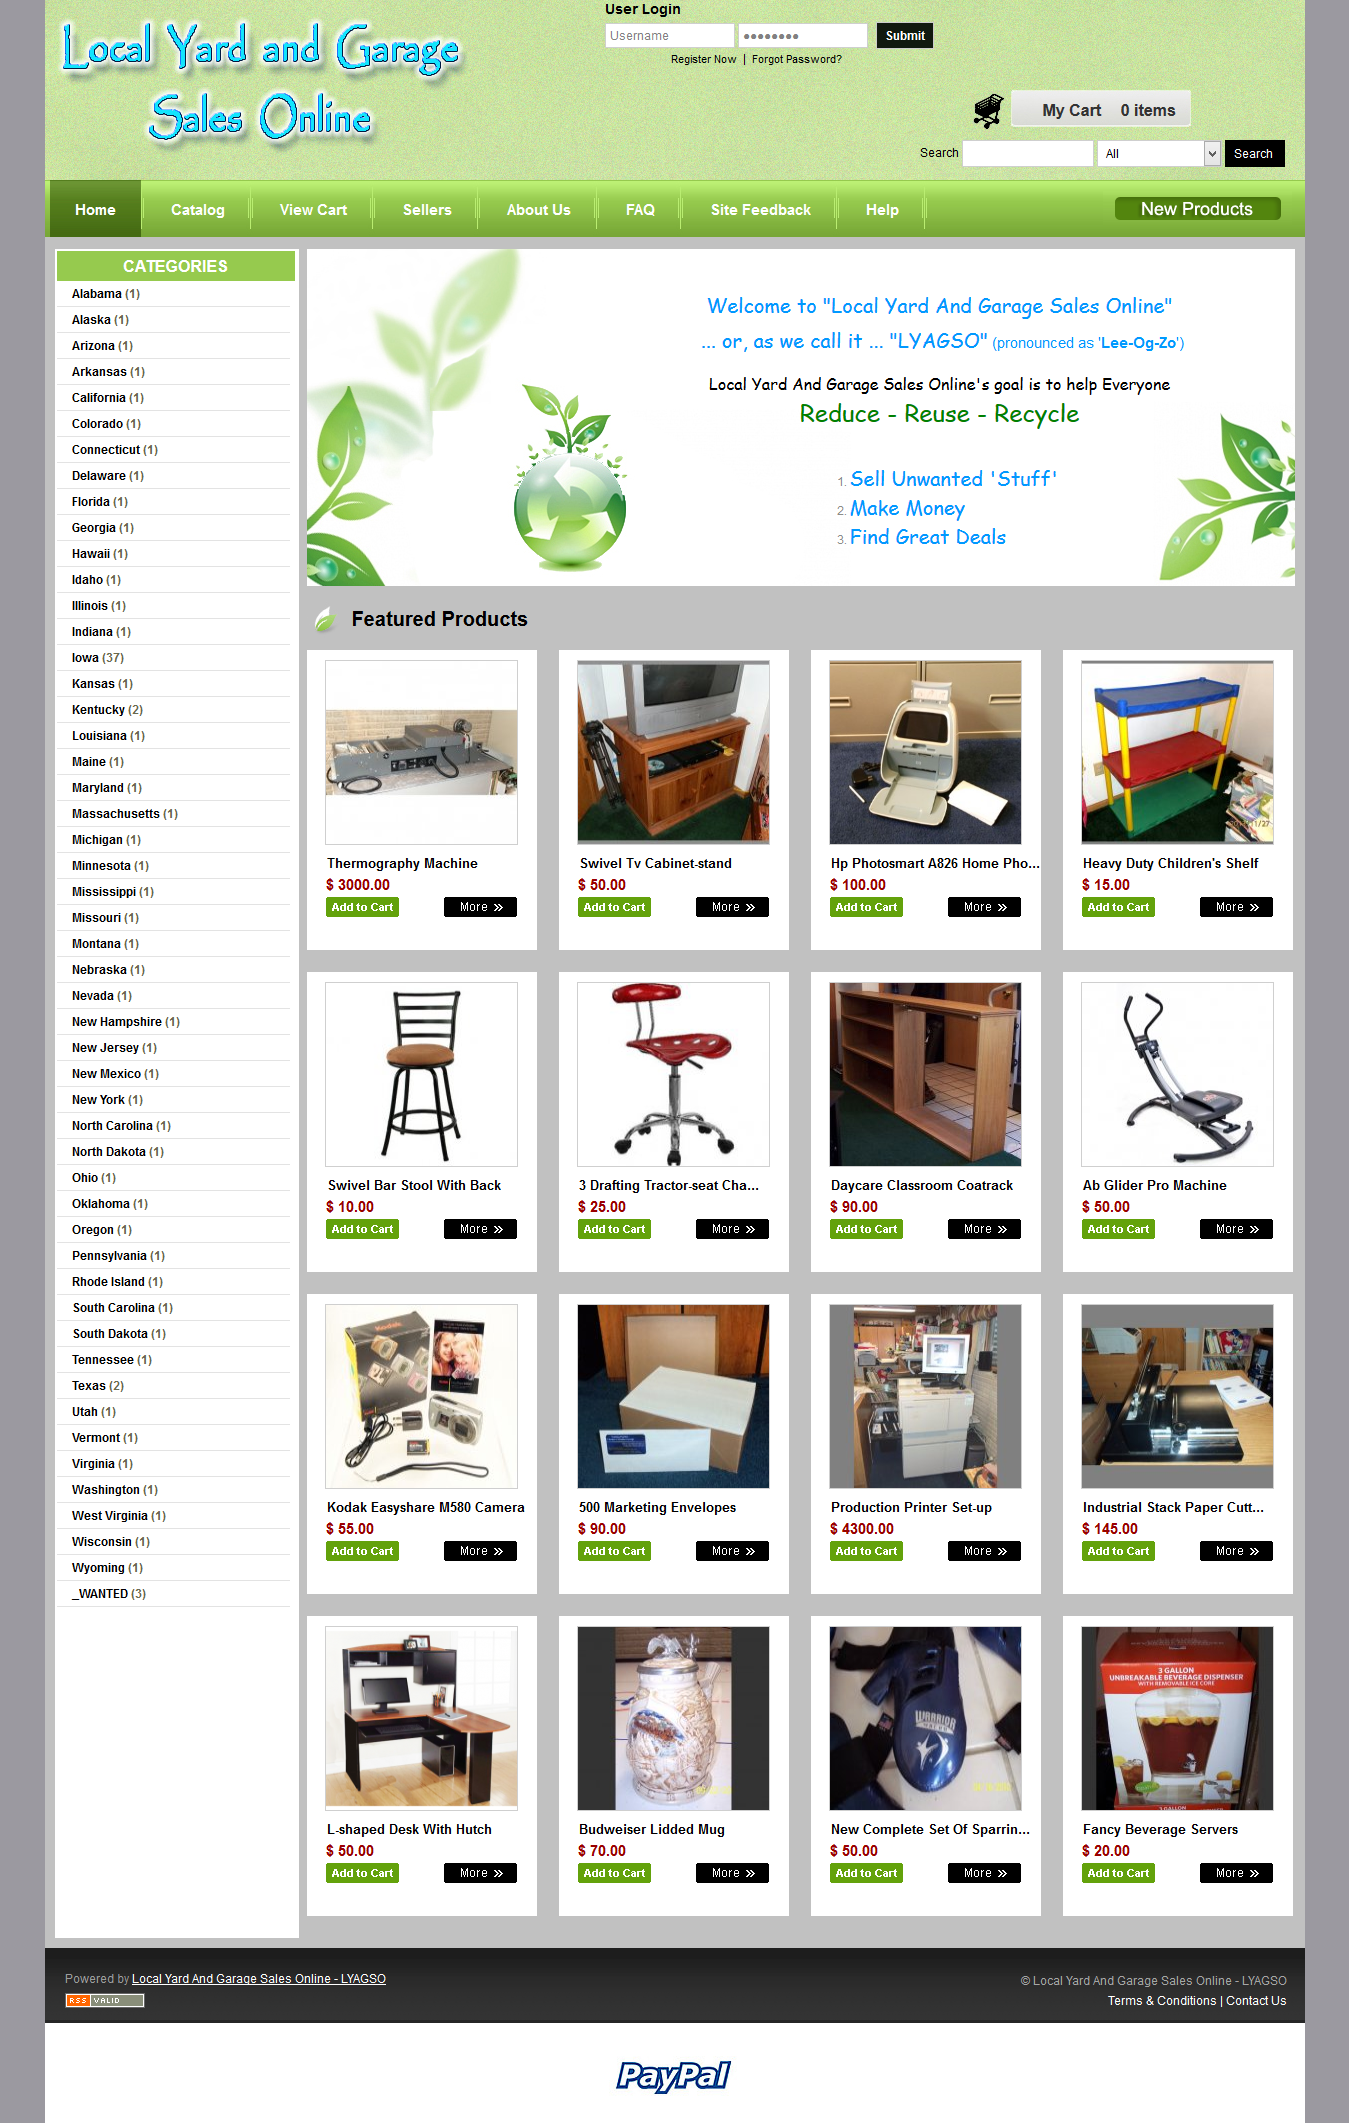 Local Yard and Garage Sales Online